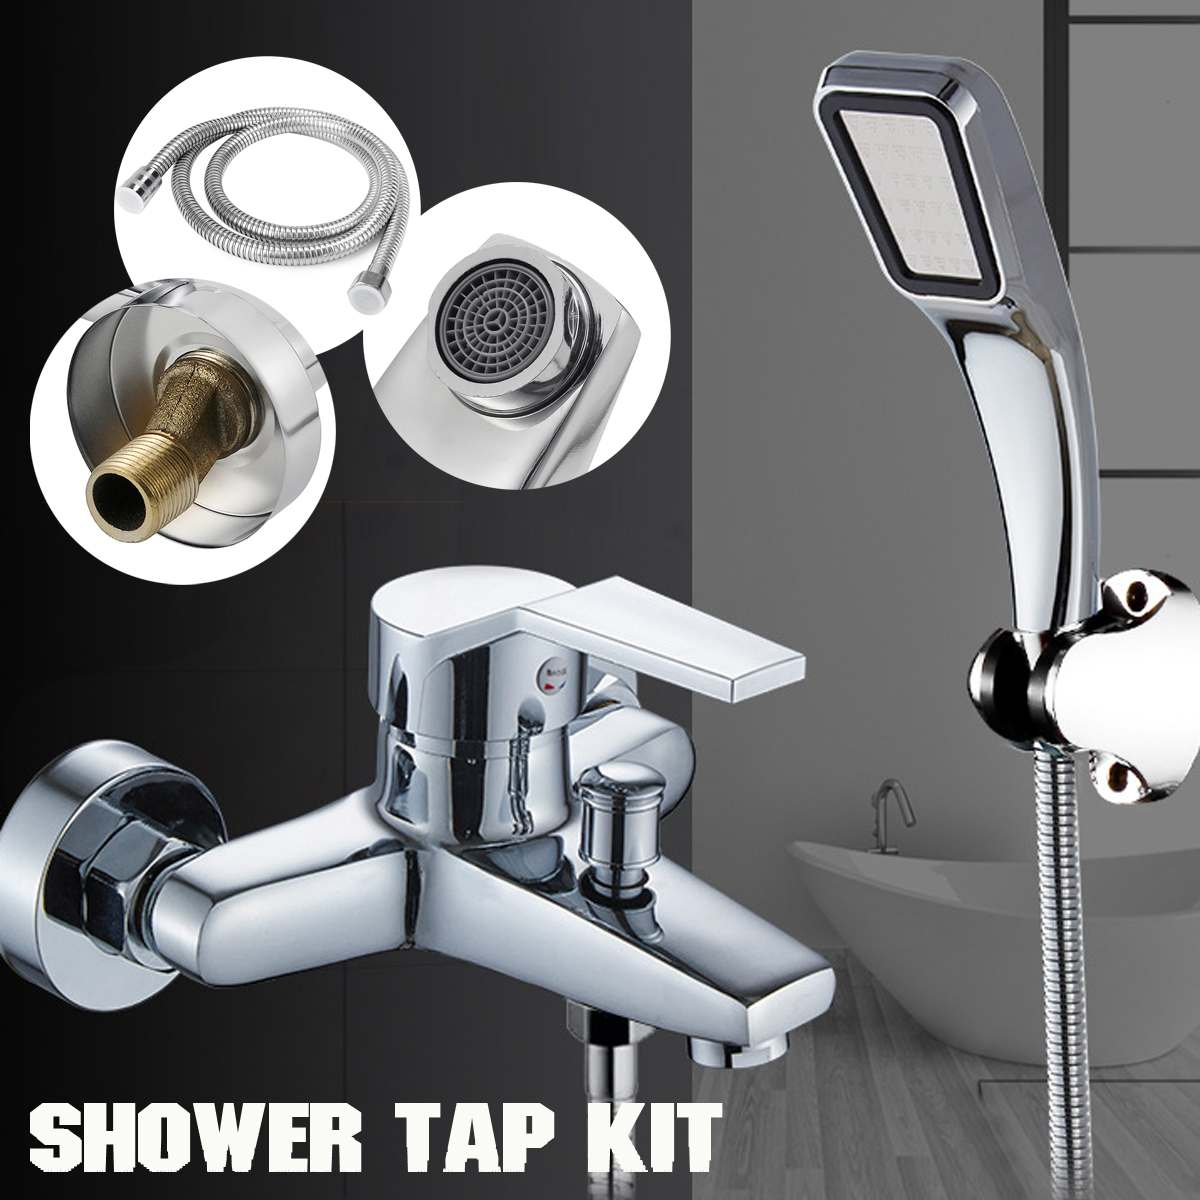 Becornce Bathtub Faucet Bath Faucet Mixer Tap Wall Mounted Hand Held Shower Head Kit Shower Faucet Sets Bath Water Mixer